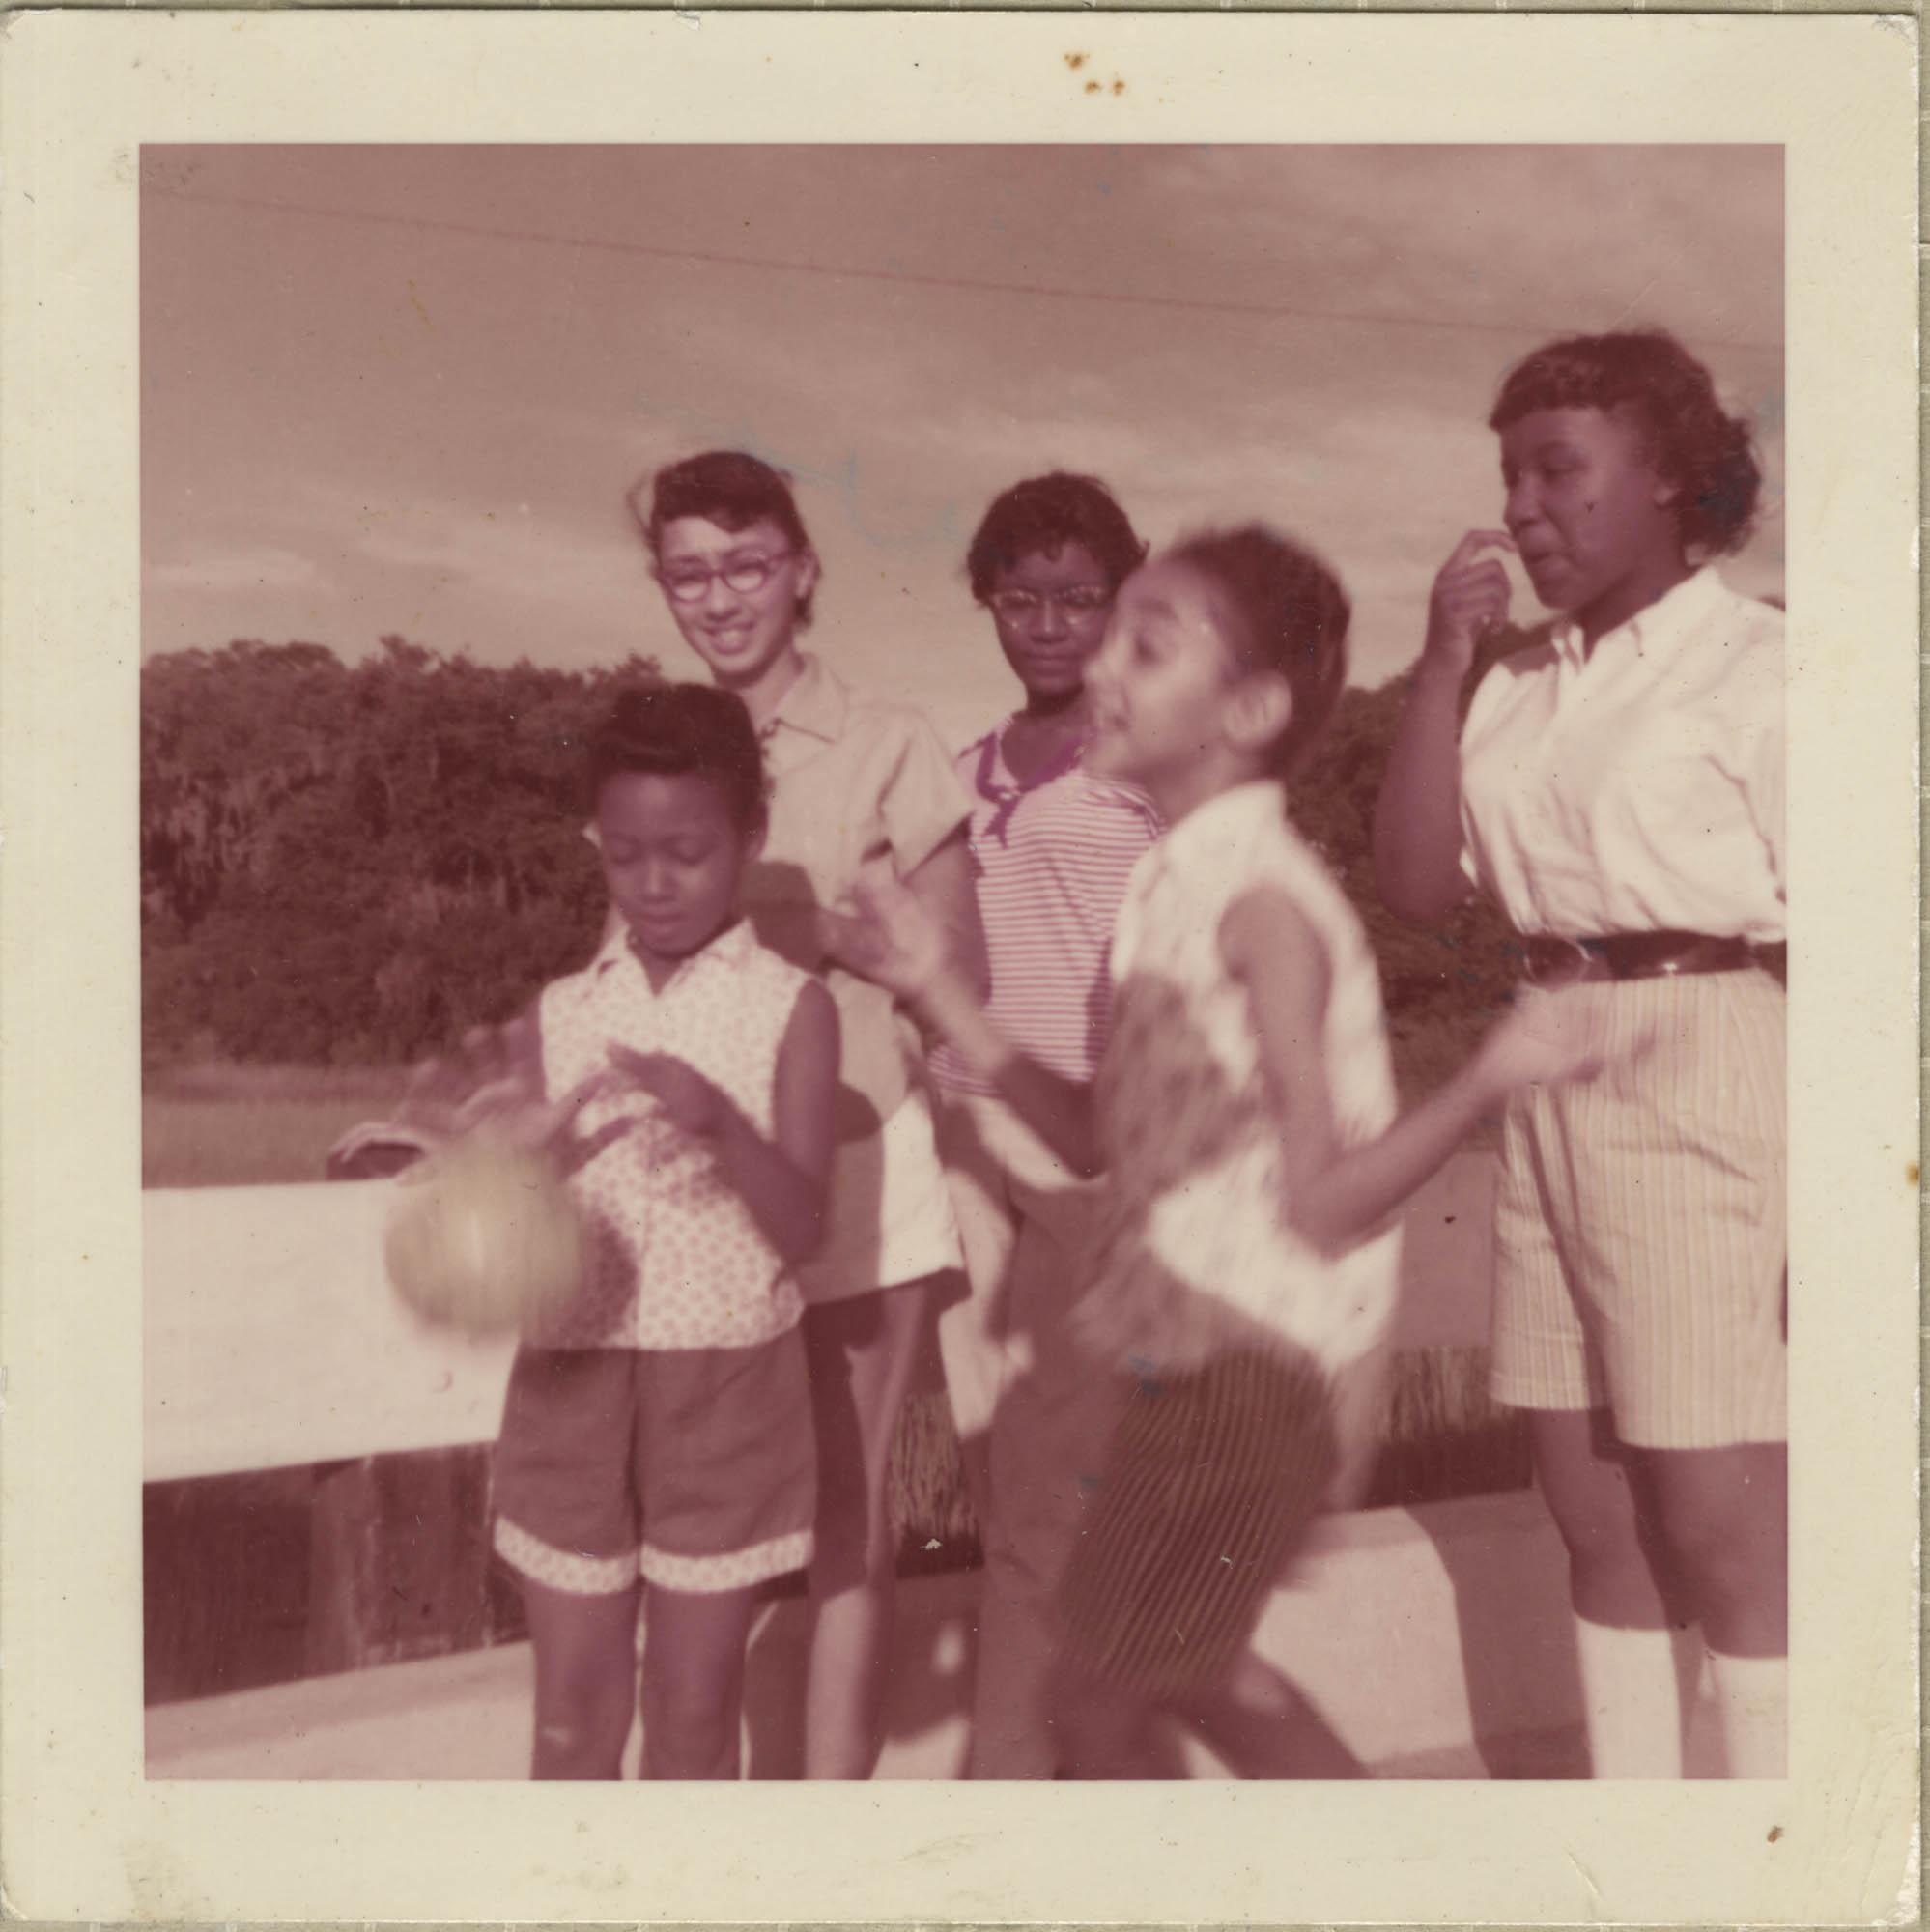 Photograph of Maede Joenelle Brown, Linda Kershaw, Millicent Brown, Barbara Bryant, and Mamie Bryant